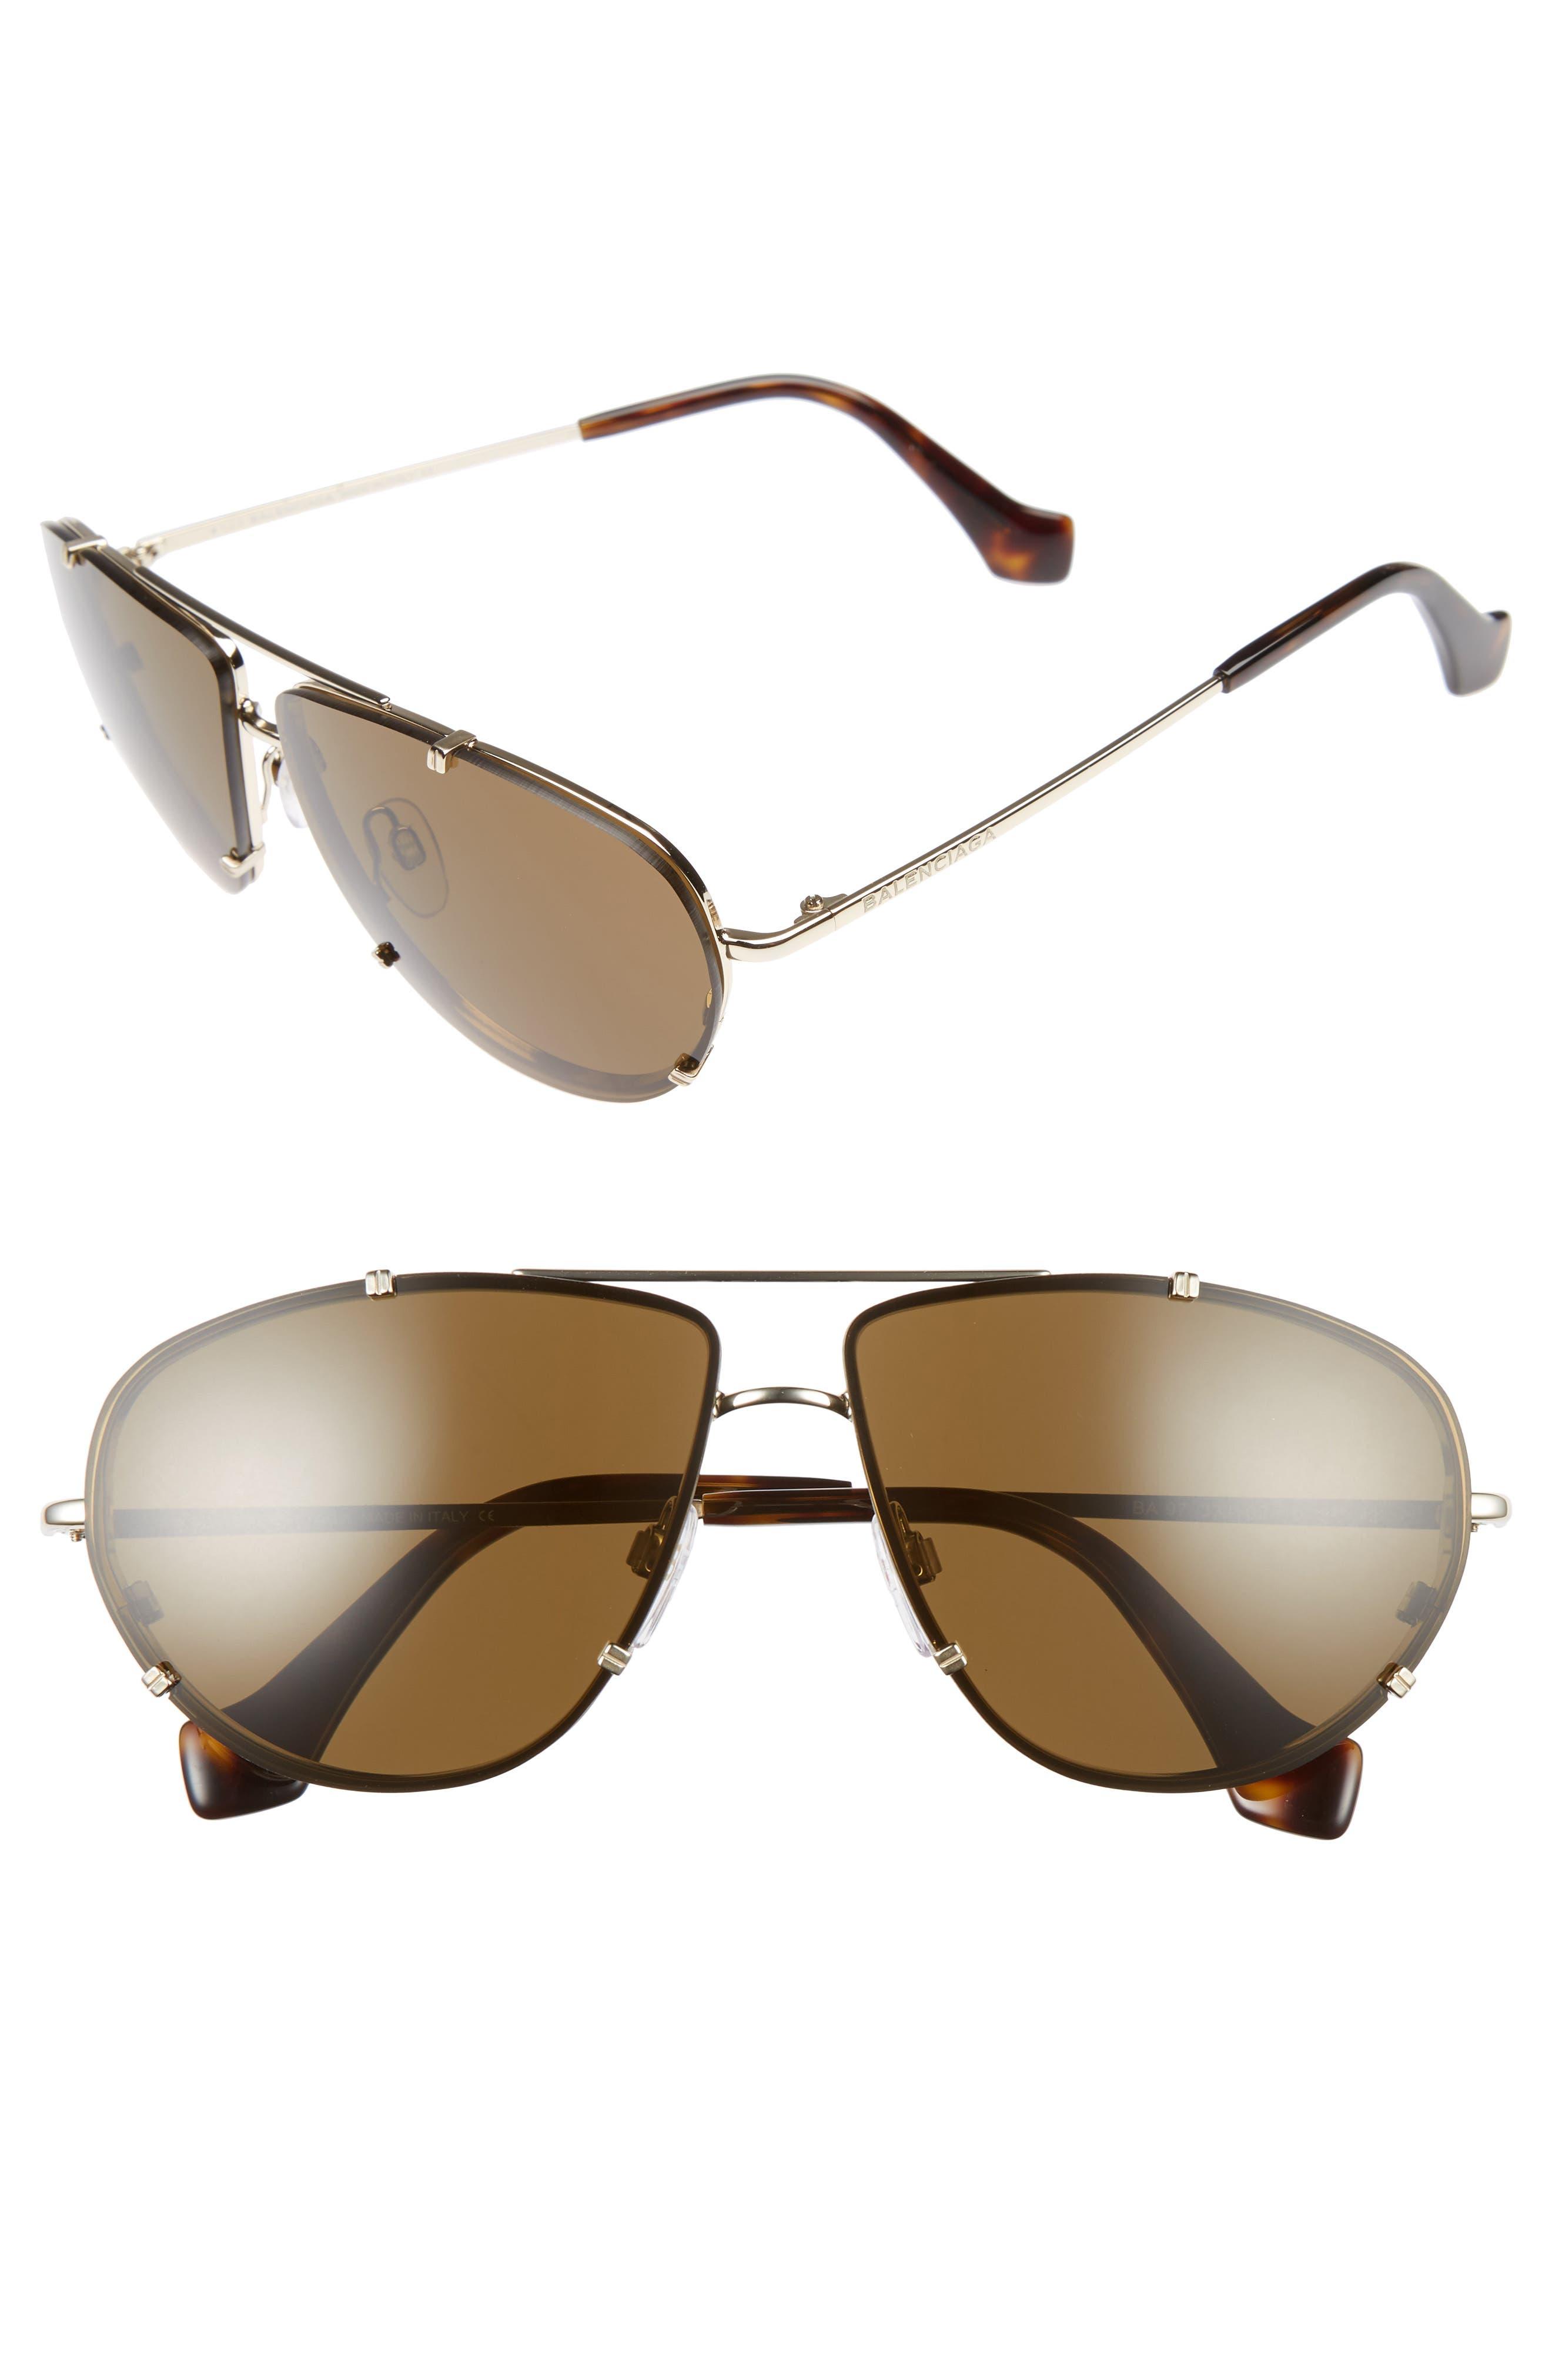 Alternate Image 1 Selected - Balenciaga 62mm Aviator Sunglasses